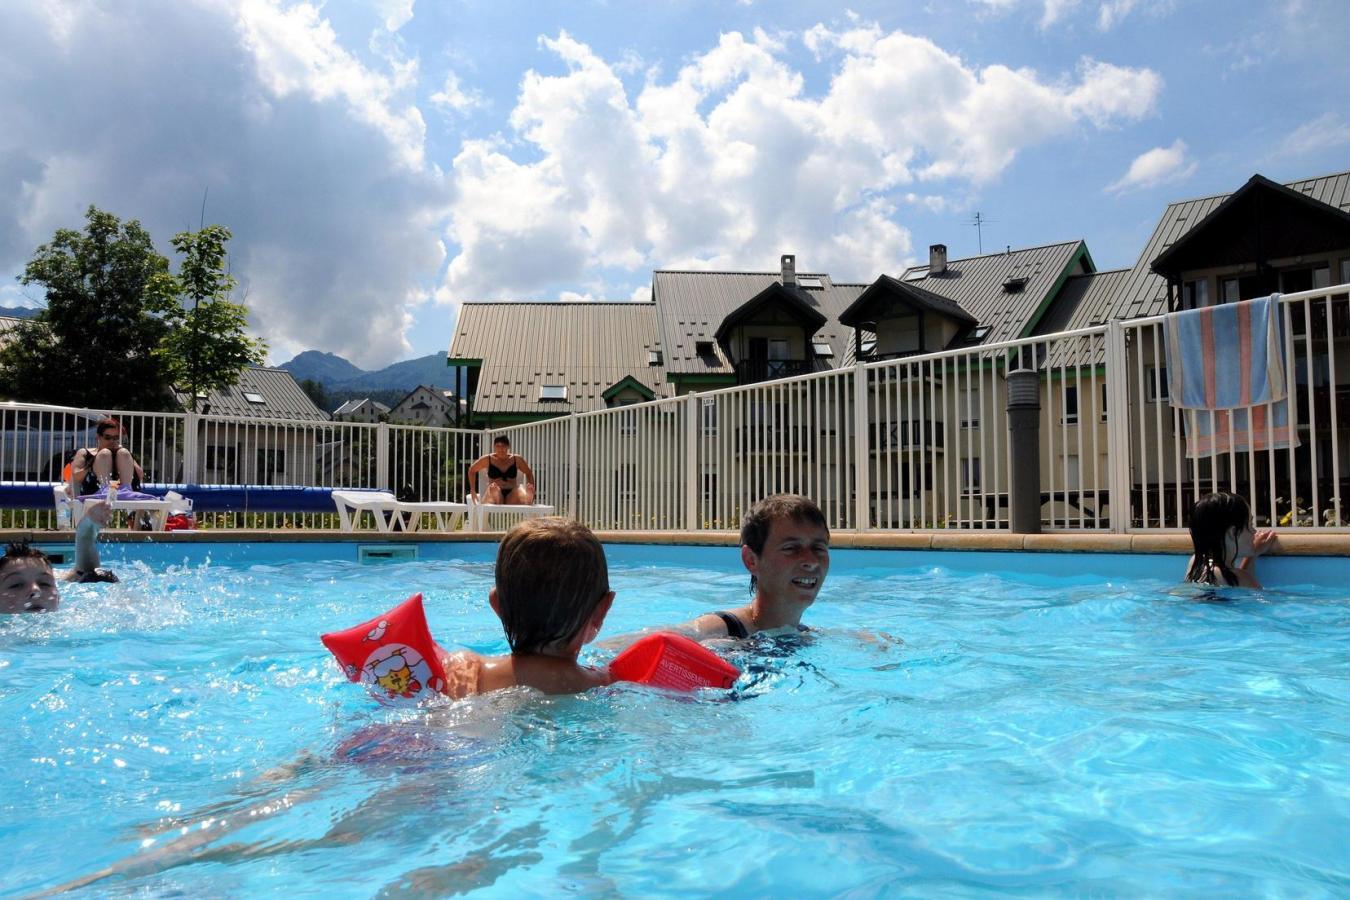 Residence la croix margot 25 villard de lans location for Villard de lans piscine